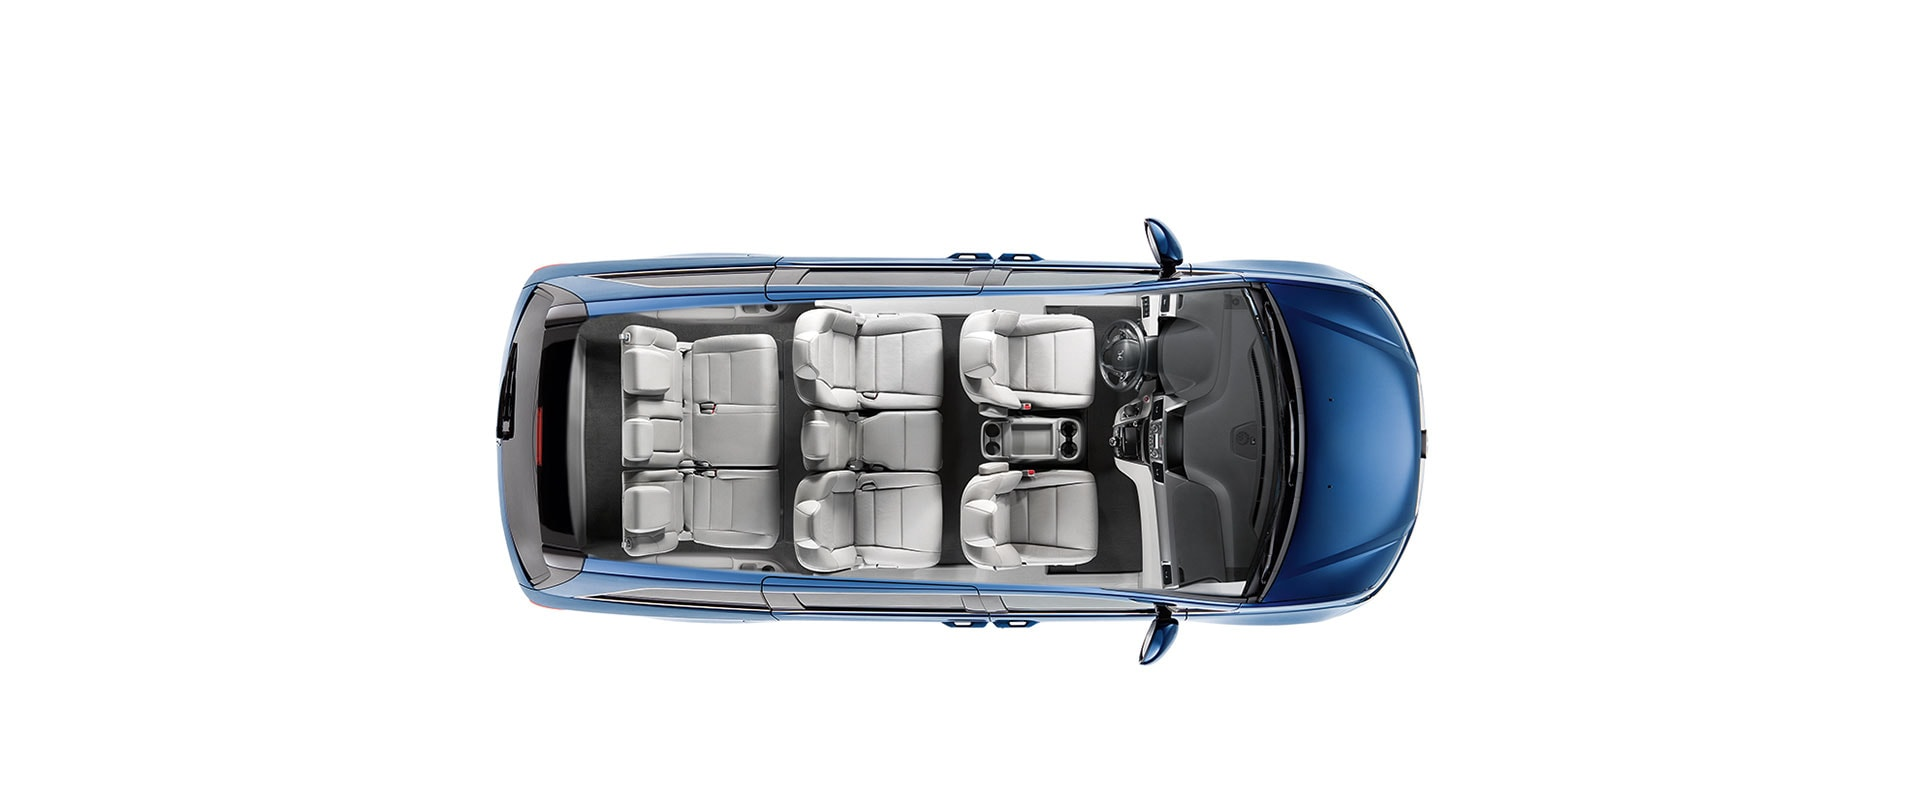 2016 Honda Odyssey Feature Details Official Honda Site